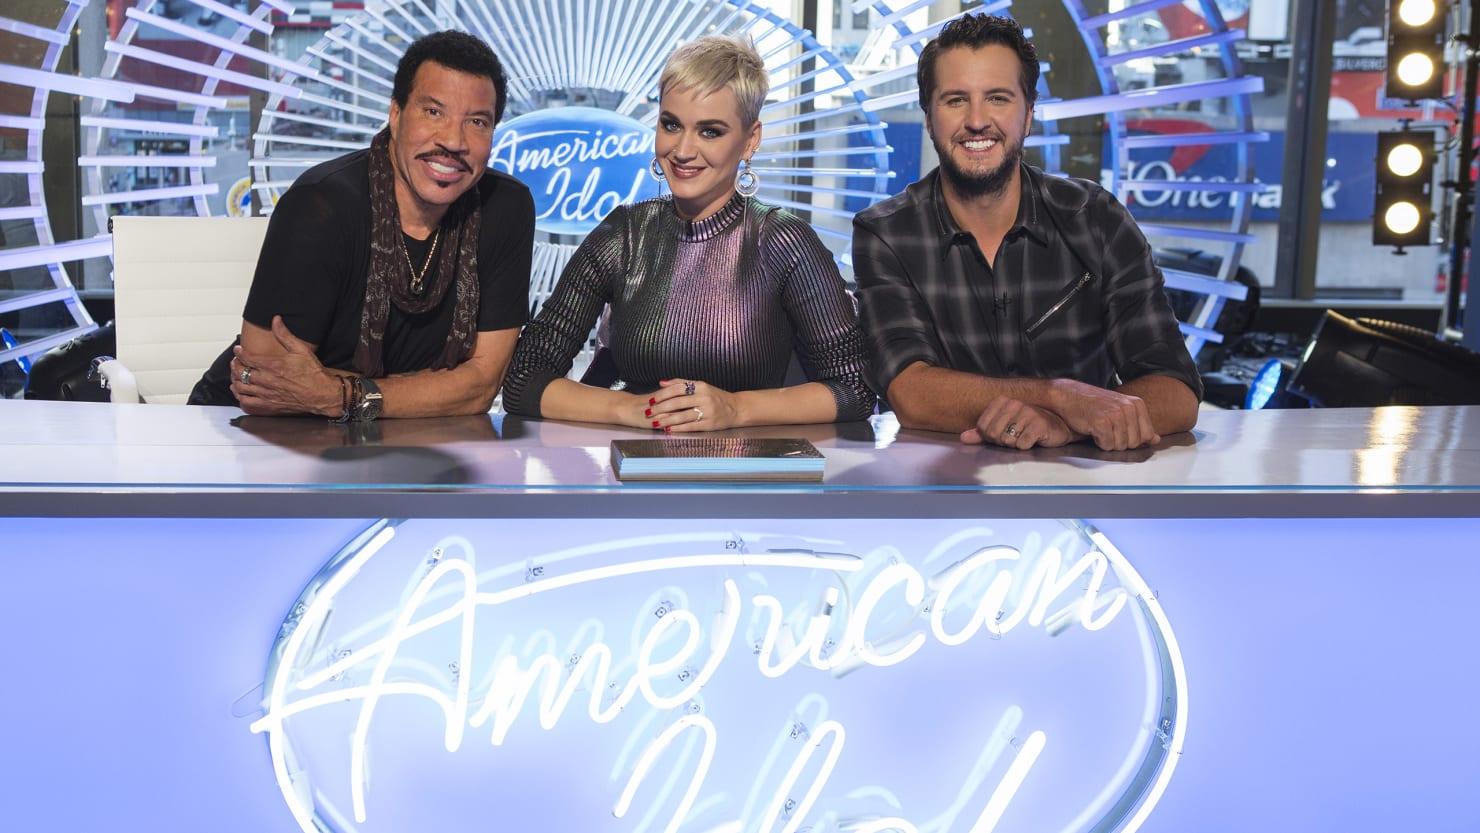 american idol country stars